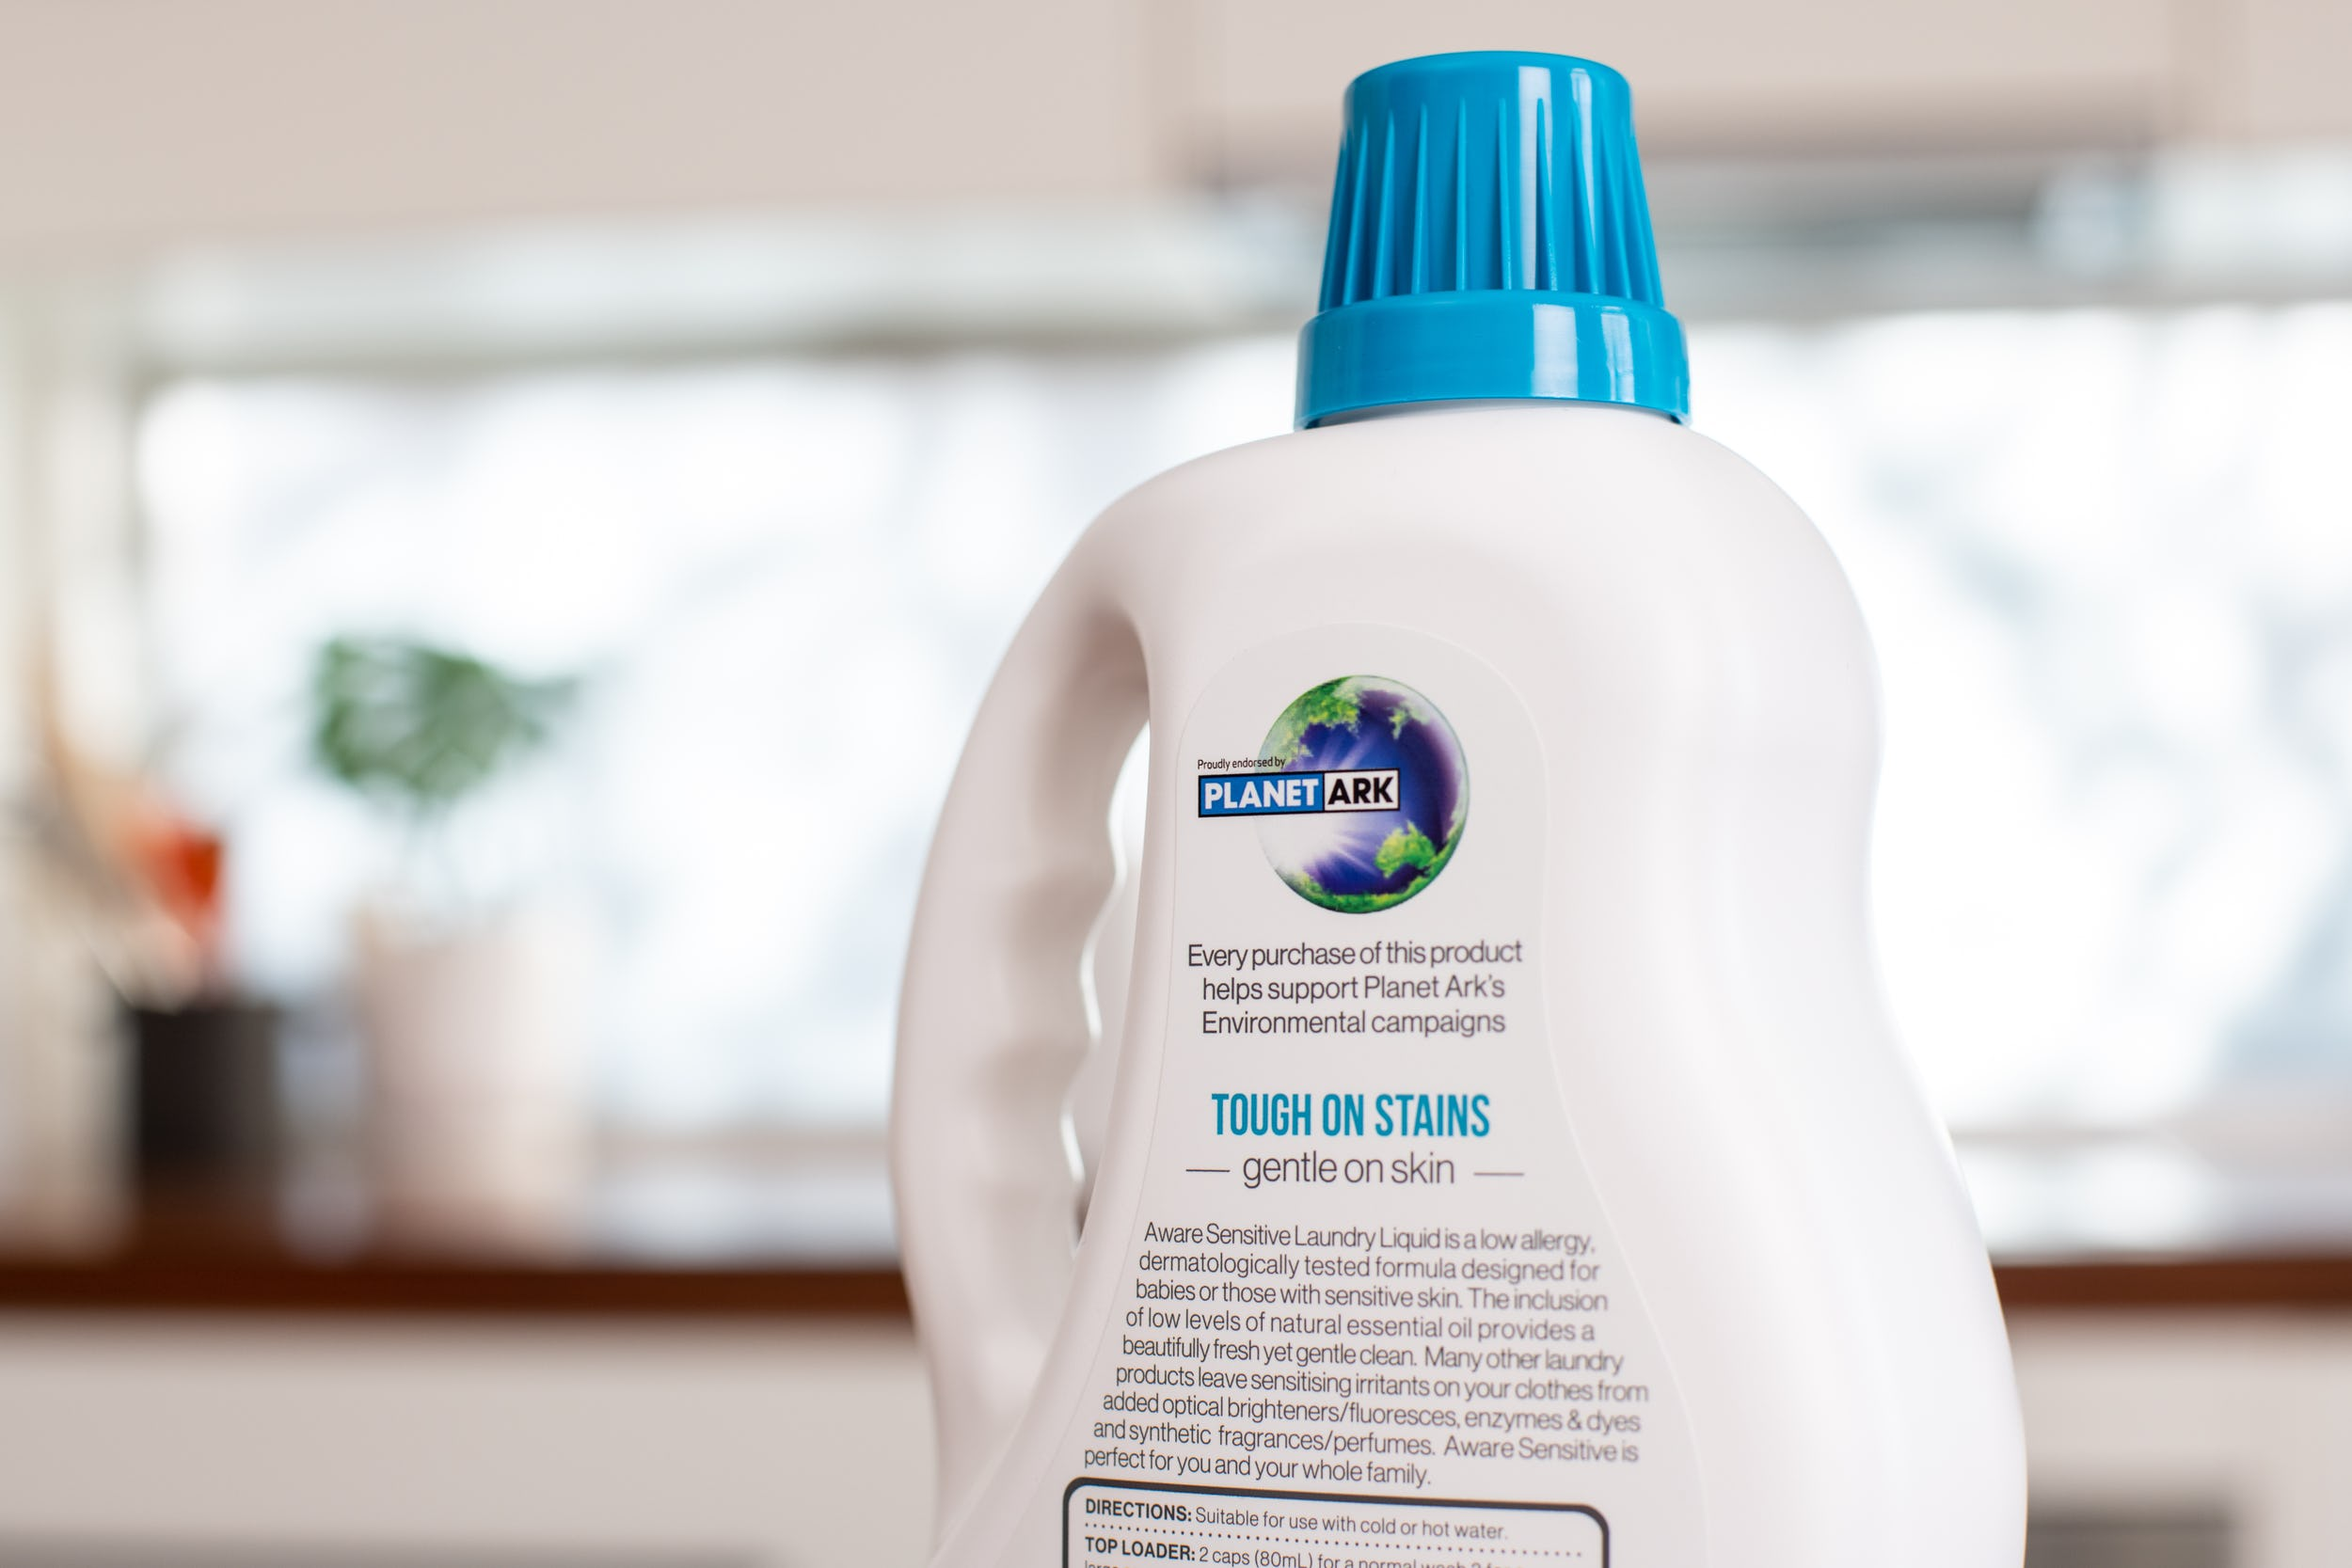 Aware Sensitive Laundry Liquid